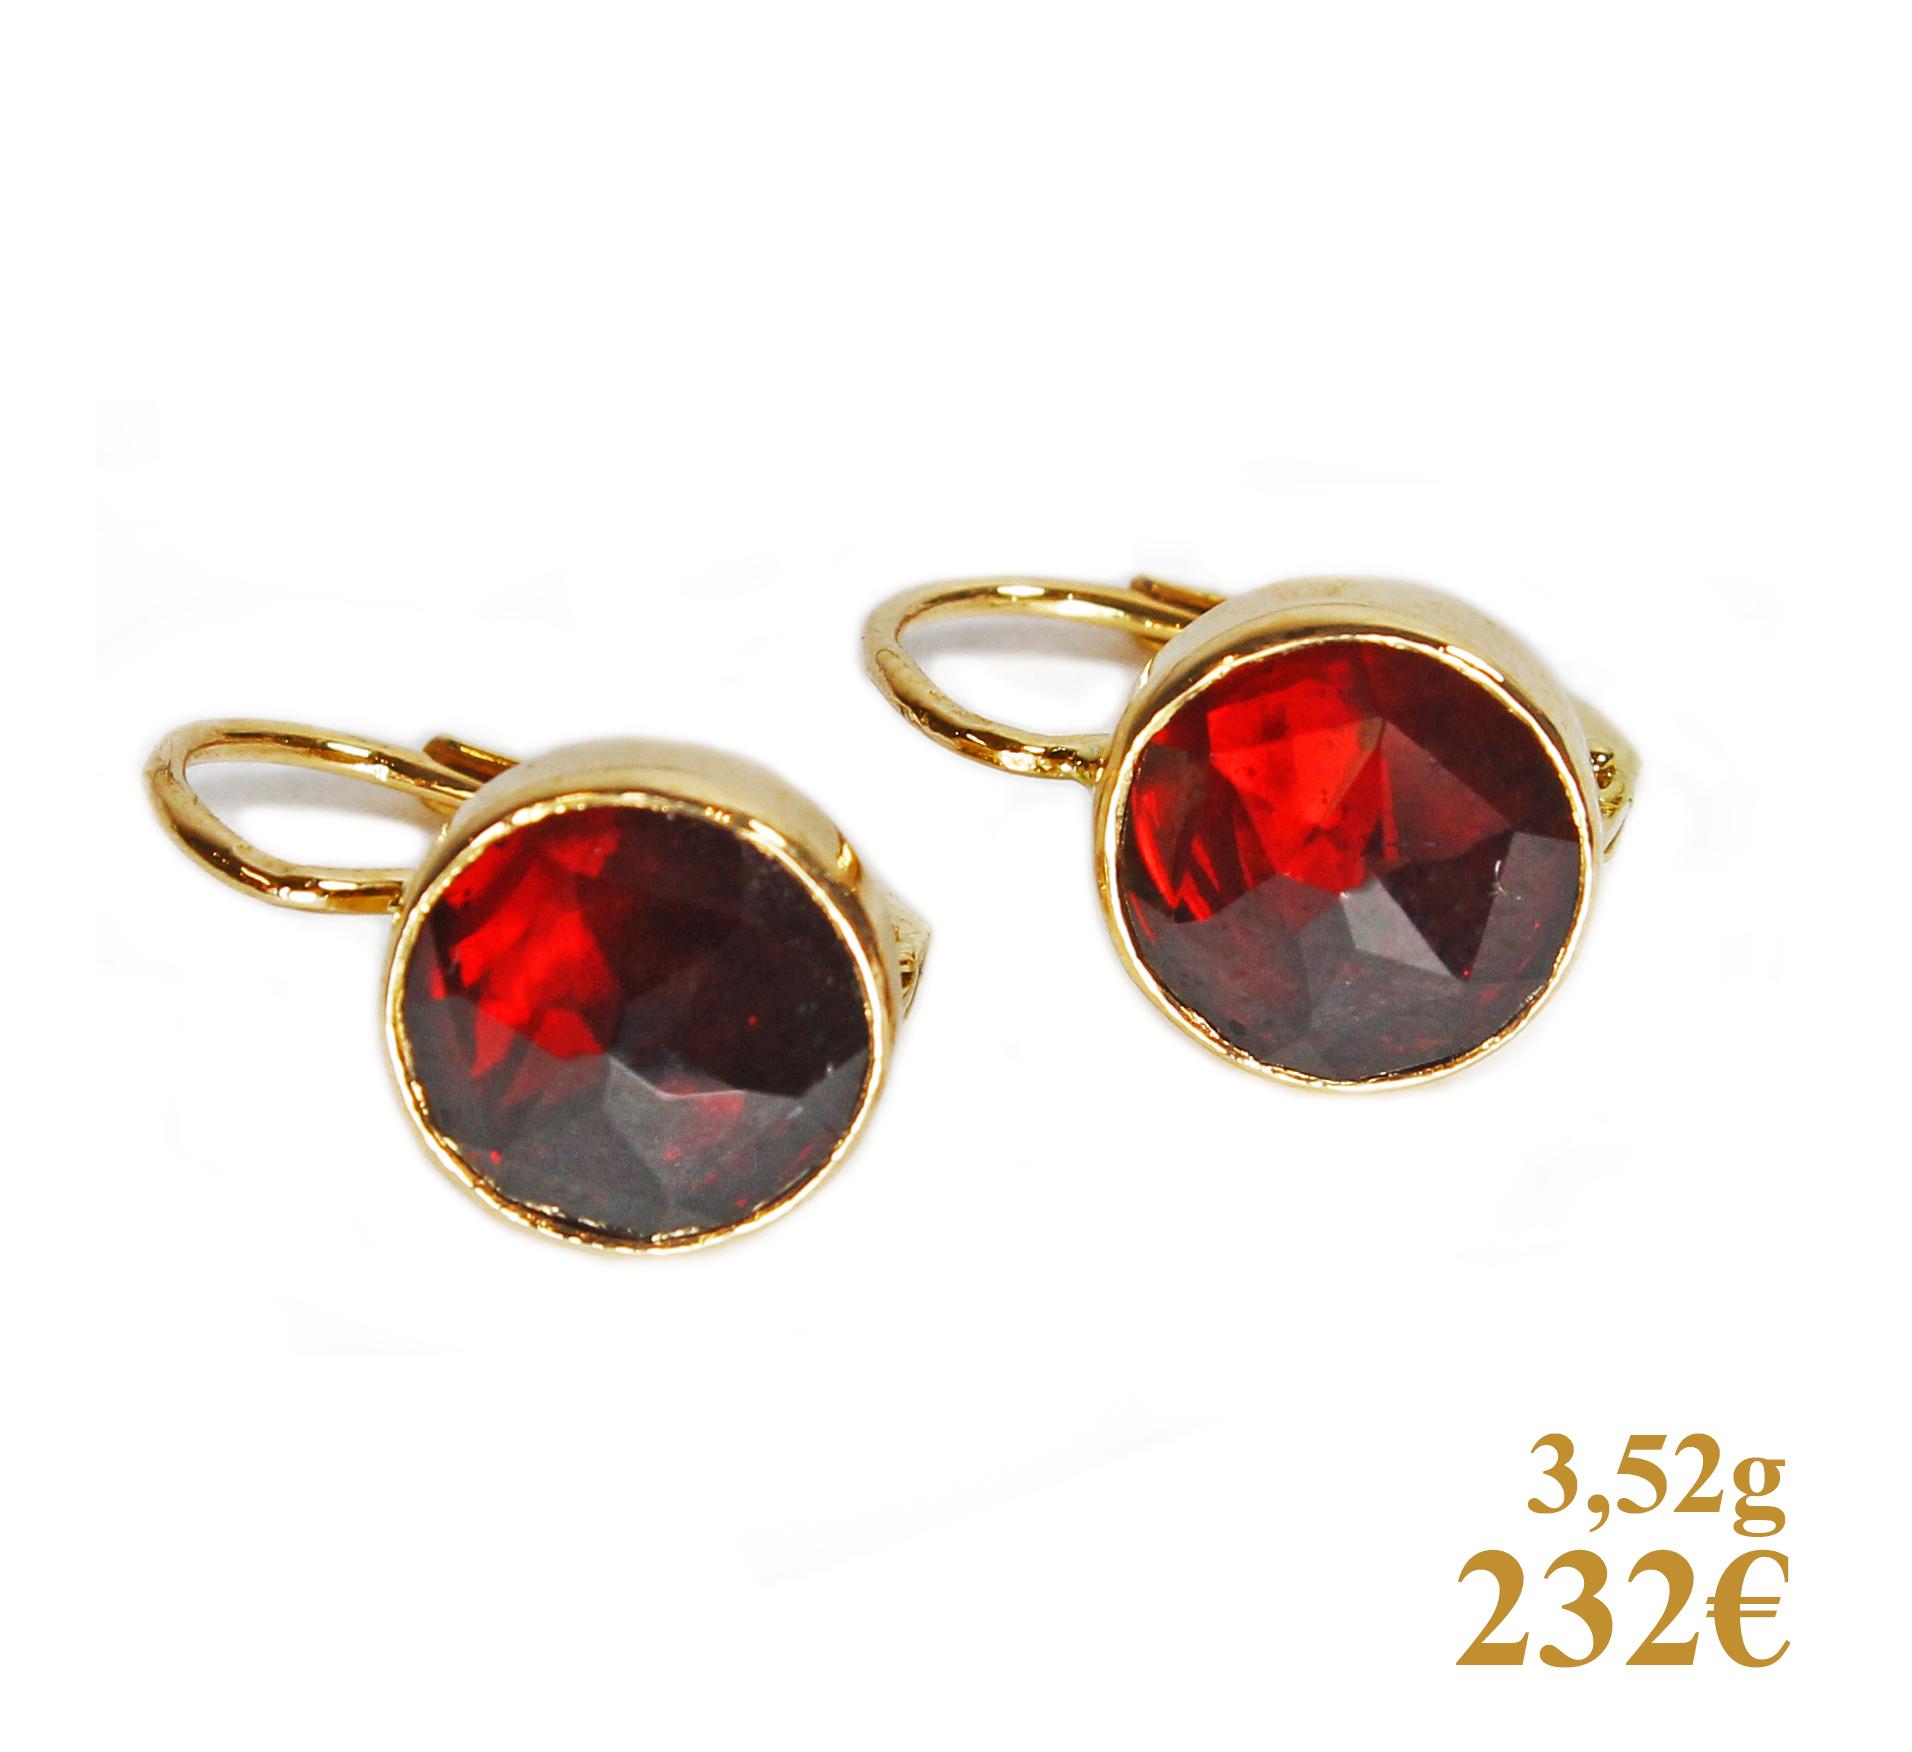 BouclesOreiGrenat-232e-3,52gr-3369